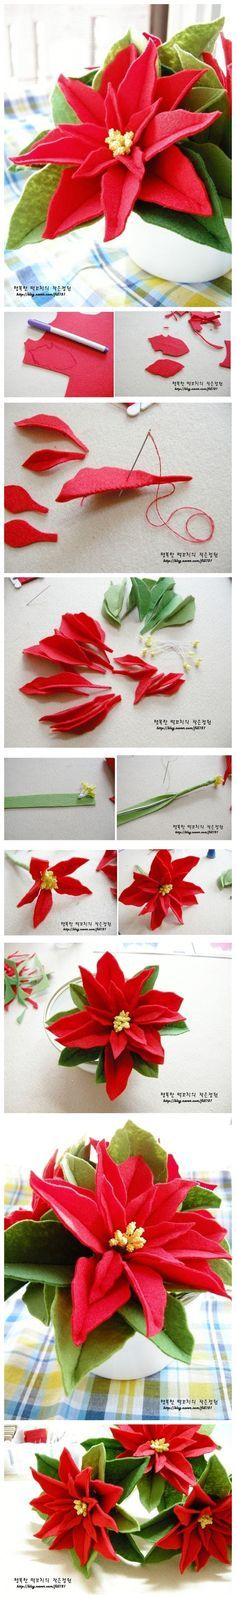 DIY Poinsettias!